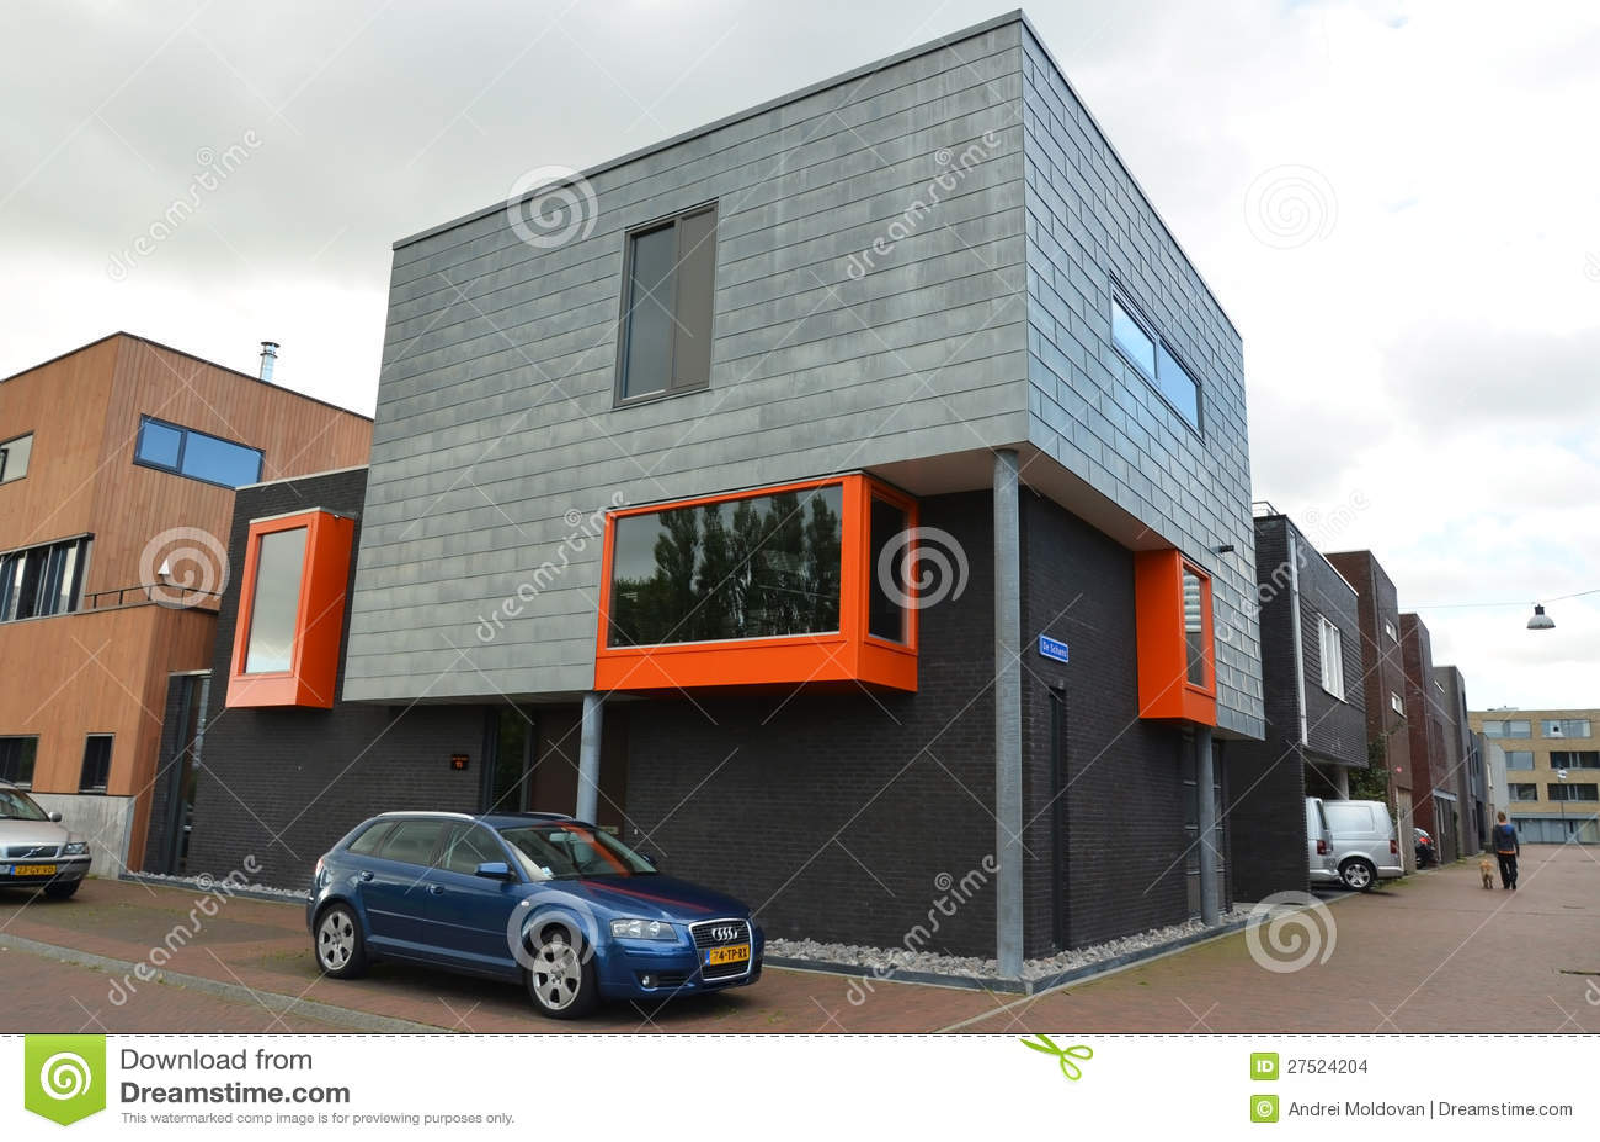 Case moderne a groningen olanda immagine stock editoriale for Foto case arredate moderne